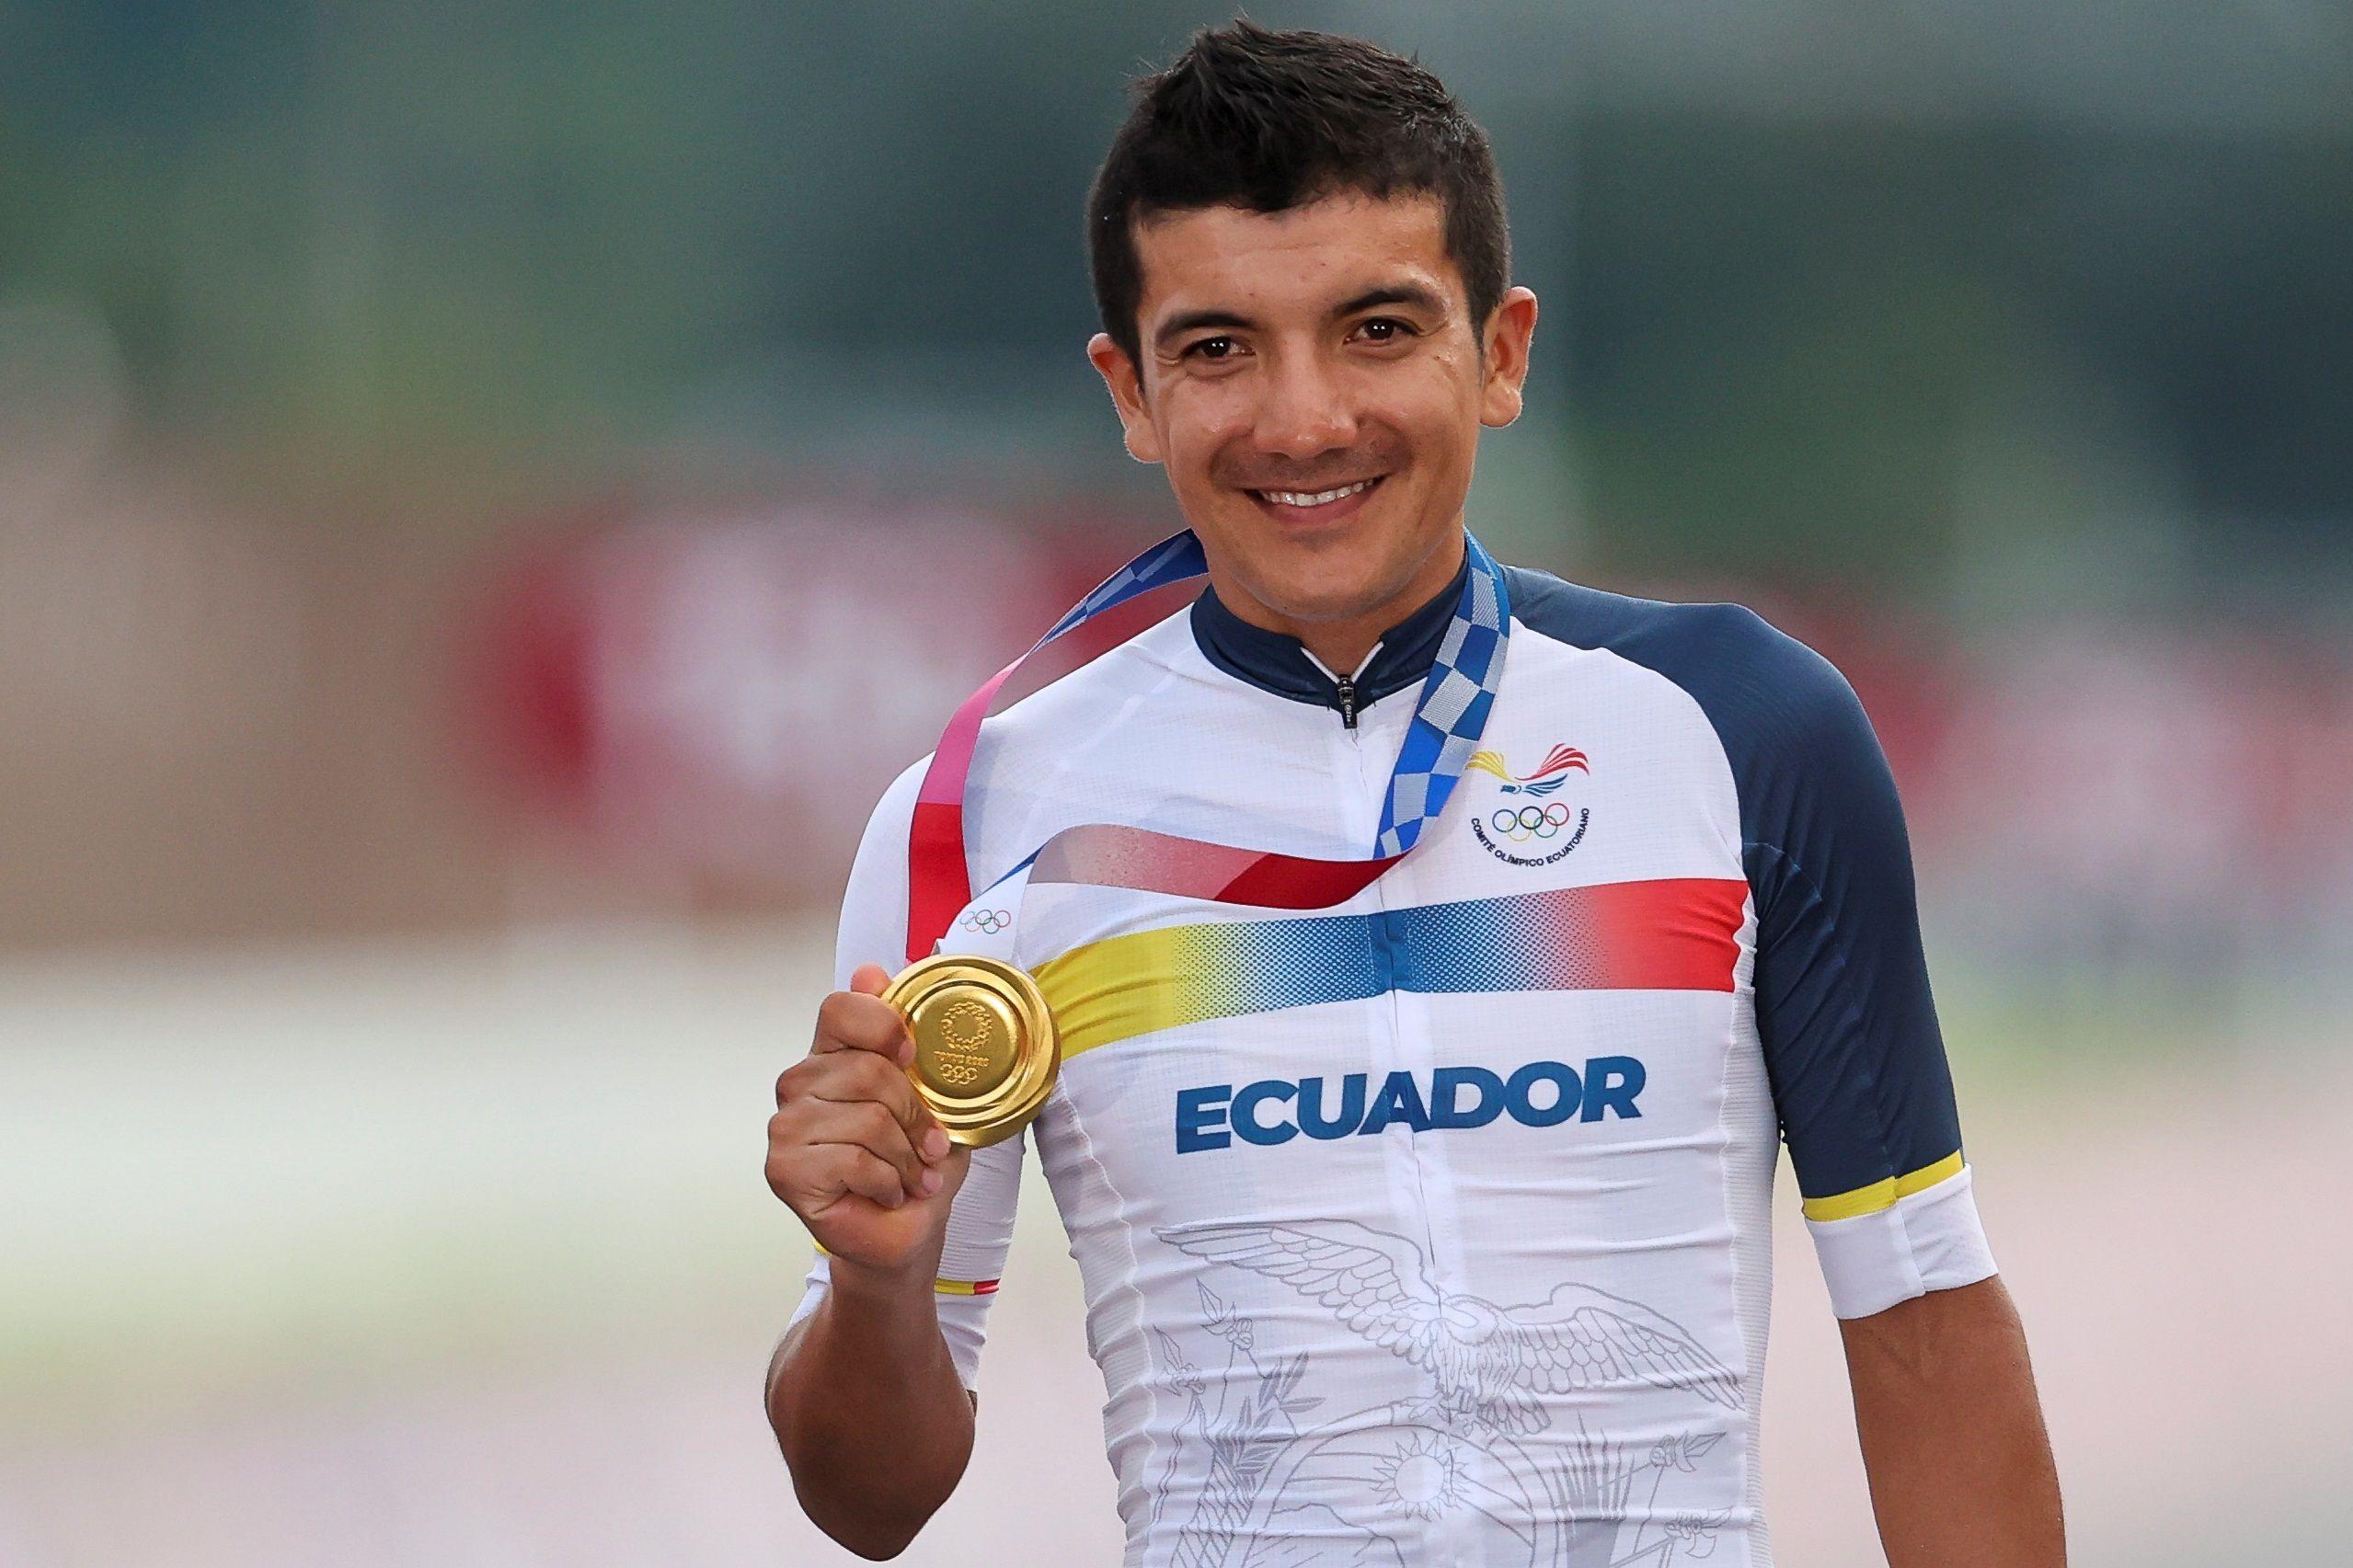 El ecuatoriano Richard Carapaz consiguió la primera medalla para Sudamérica en ciclismo en ruta masculino (Foto: Reuters)